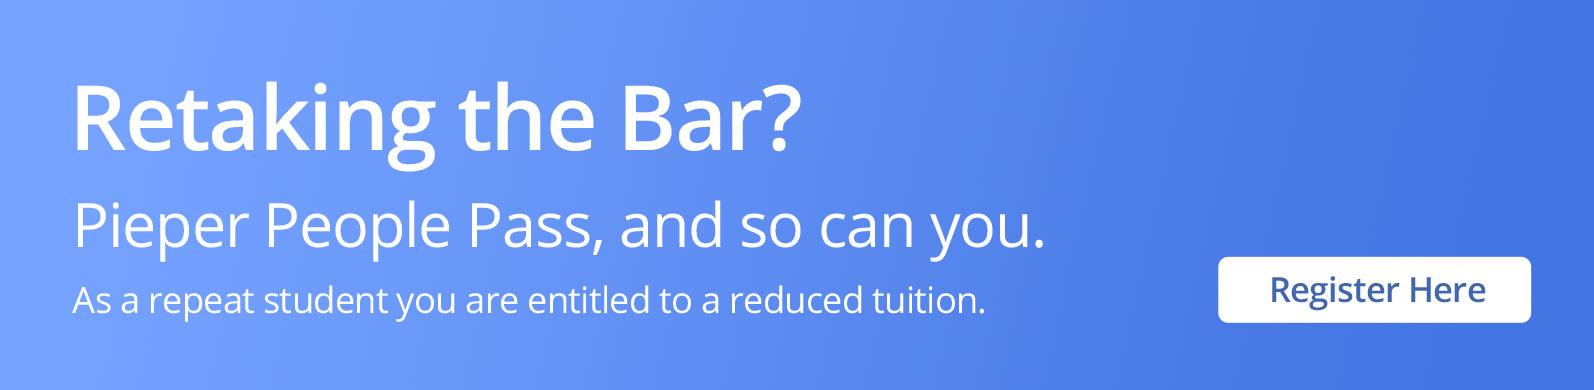 new york bar essay scoring